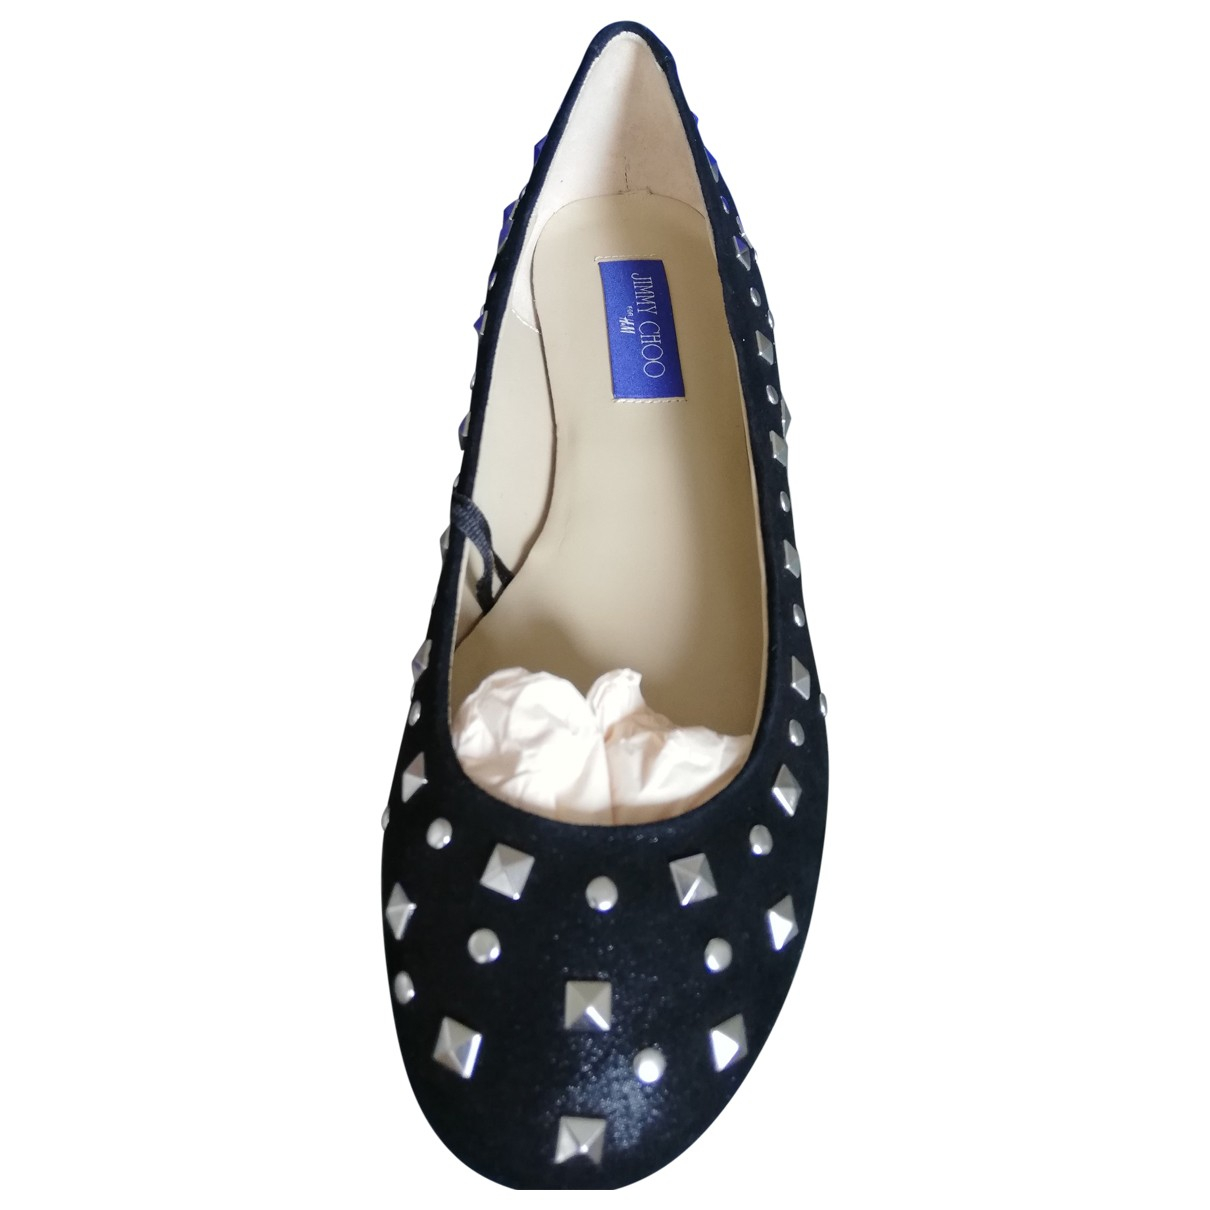 Jimmy Choo For H&m \N Black Leather Flats for Women 40 EU